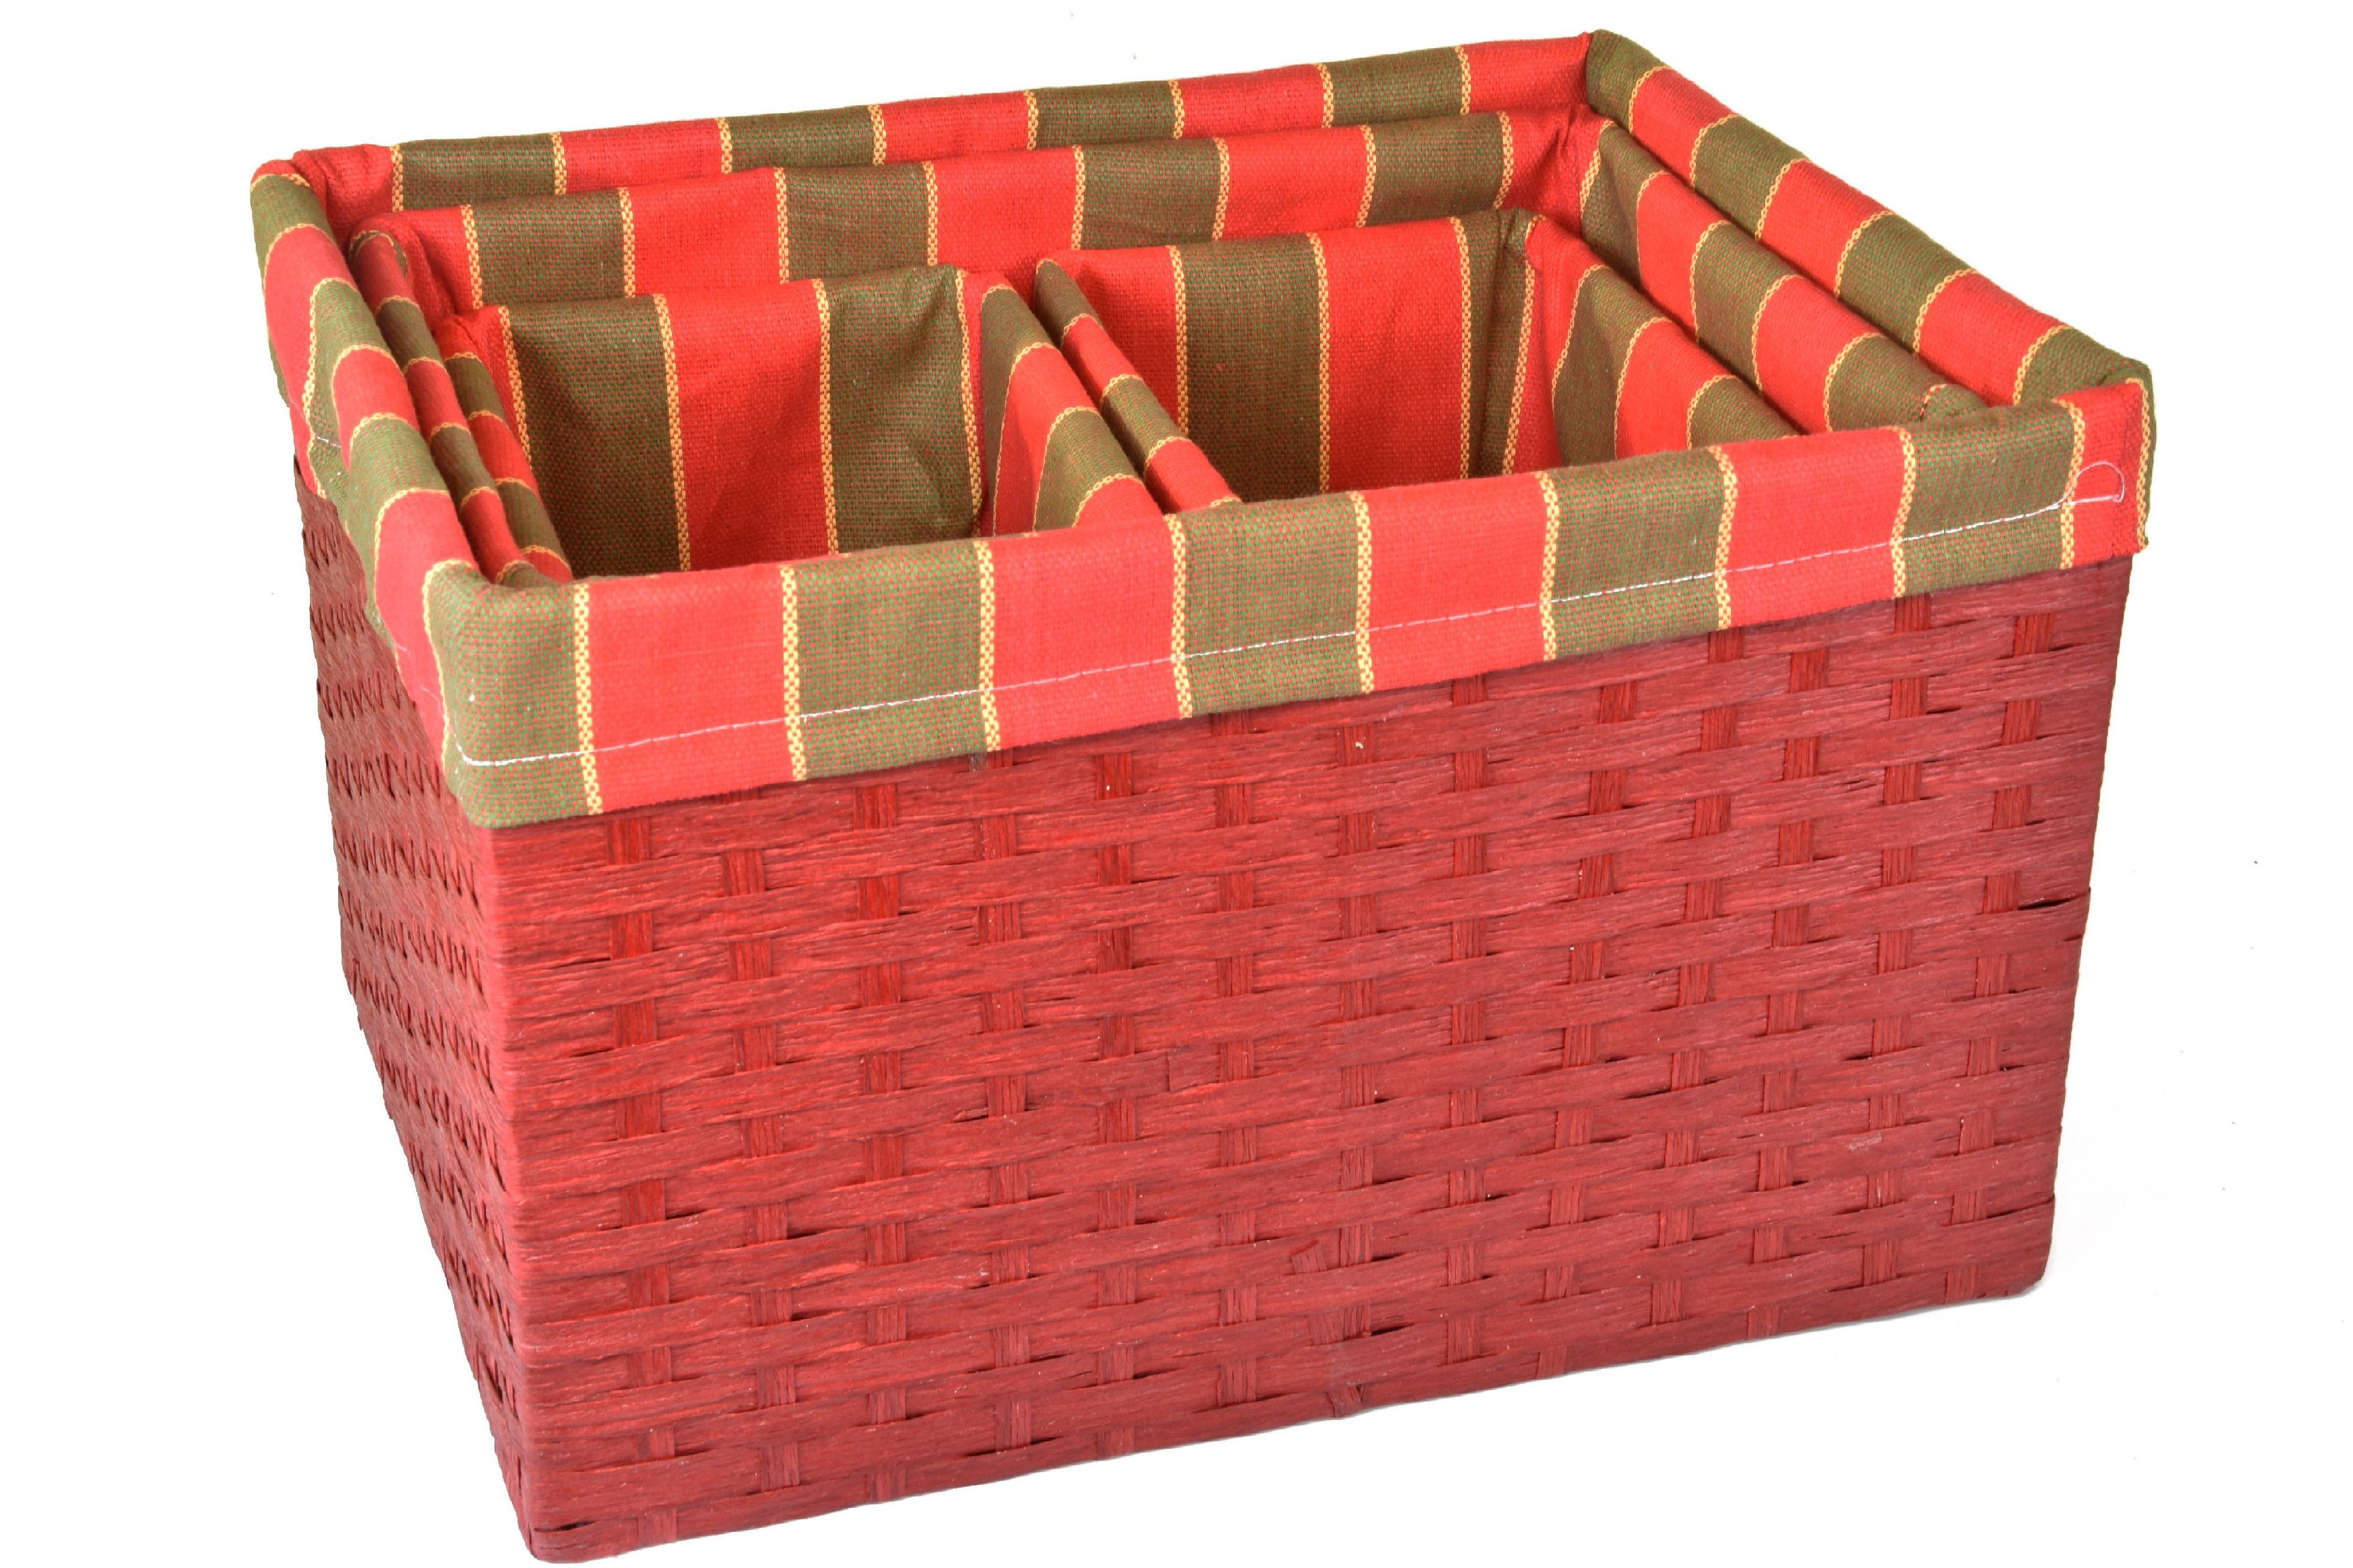 Úložný box červený rozměry boxu (cm): Sada 40x30x25,5|35x26x23,5|22x16x22,5|22x16x22,5